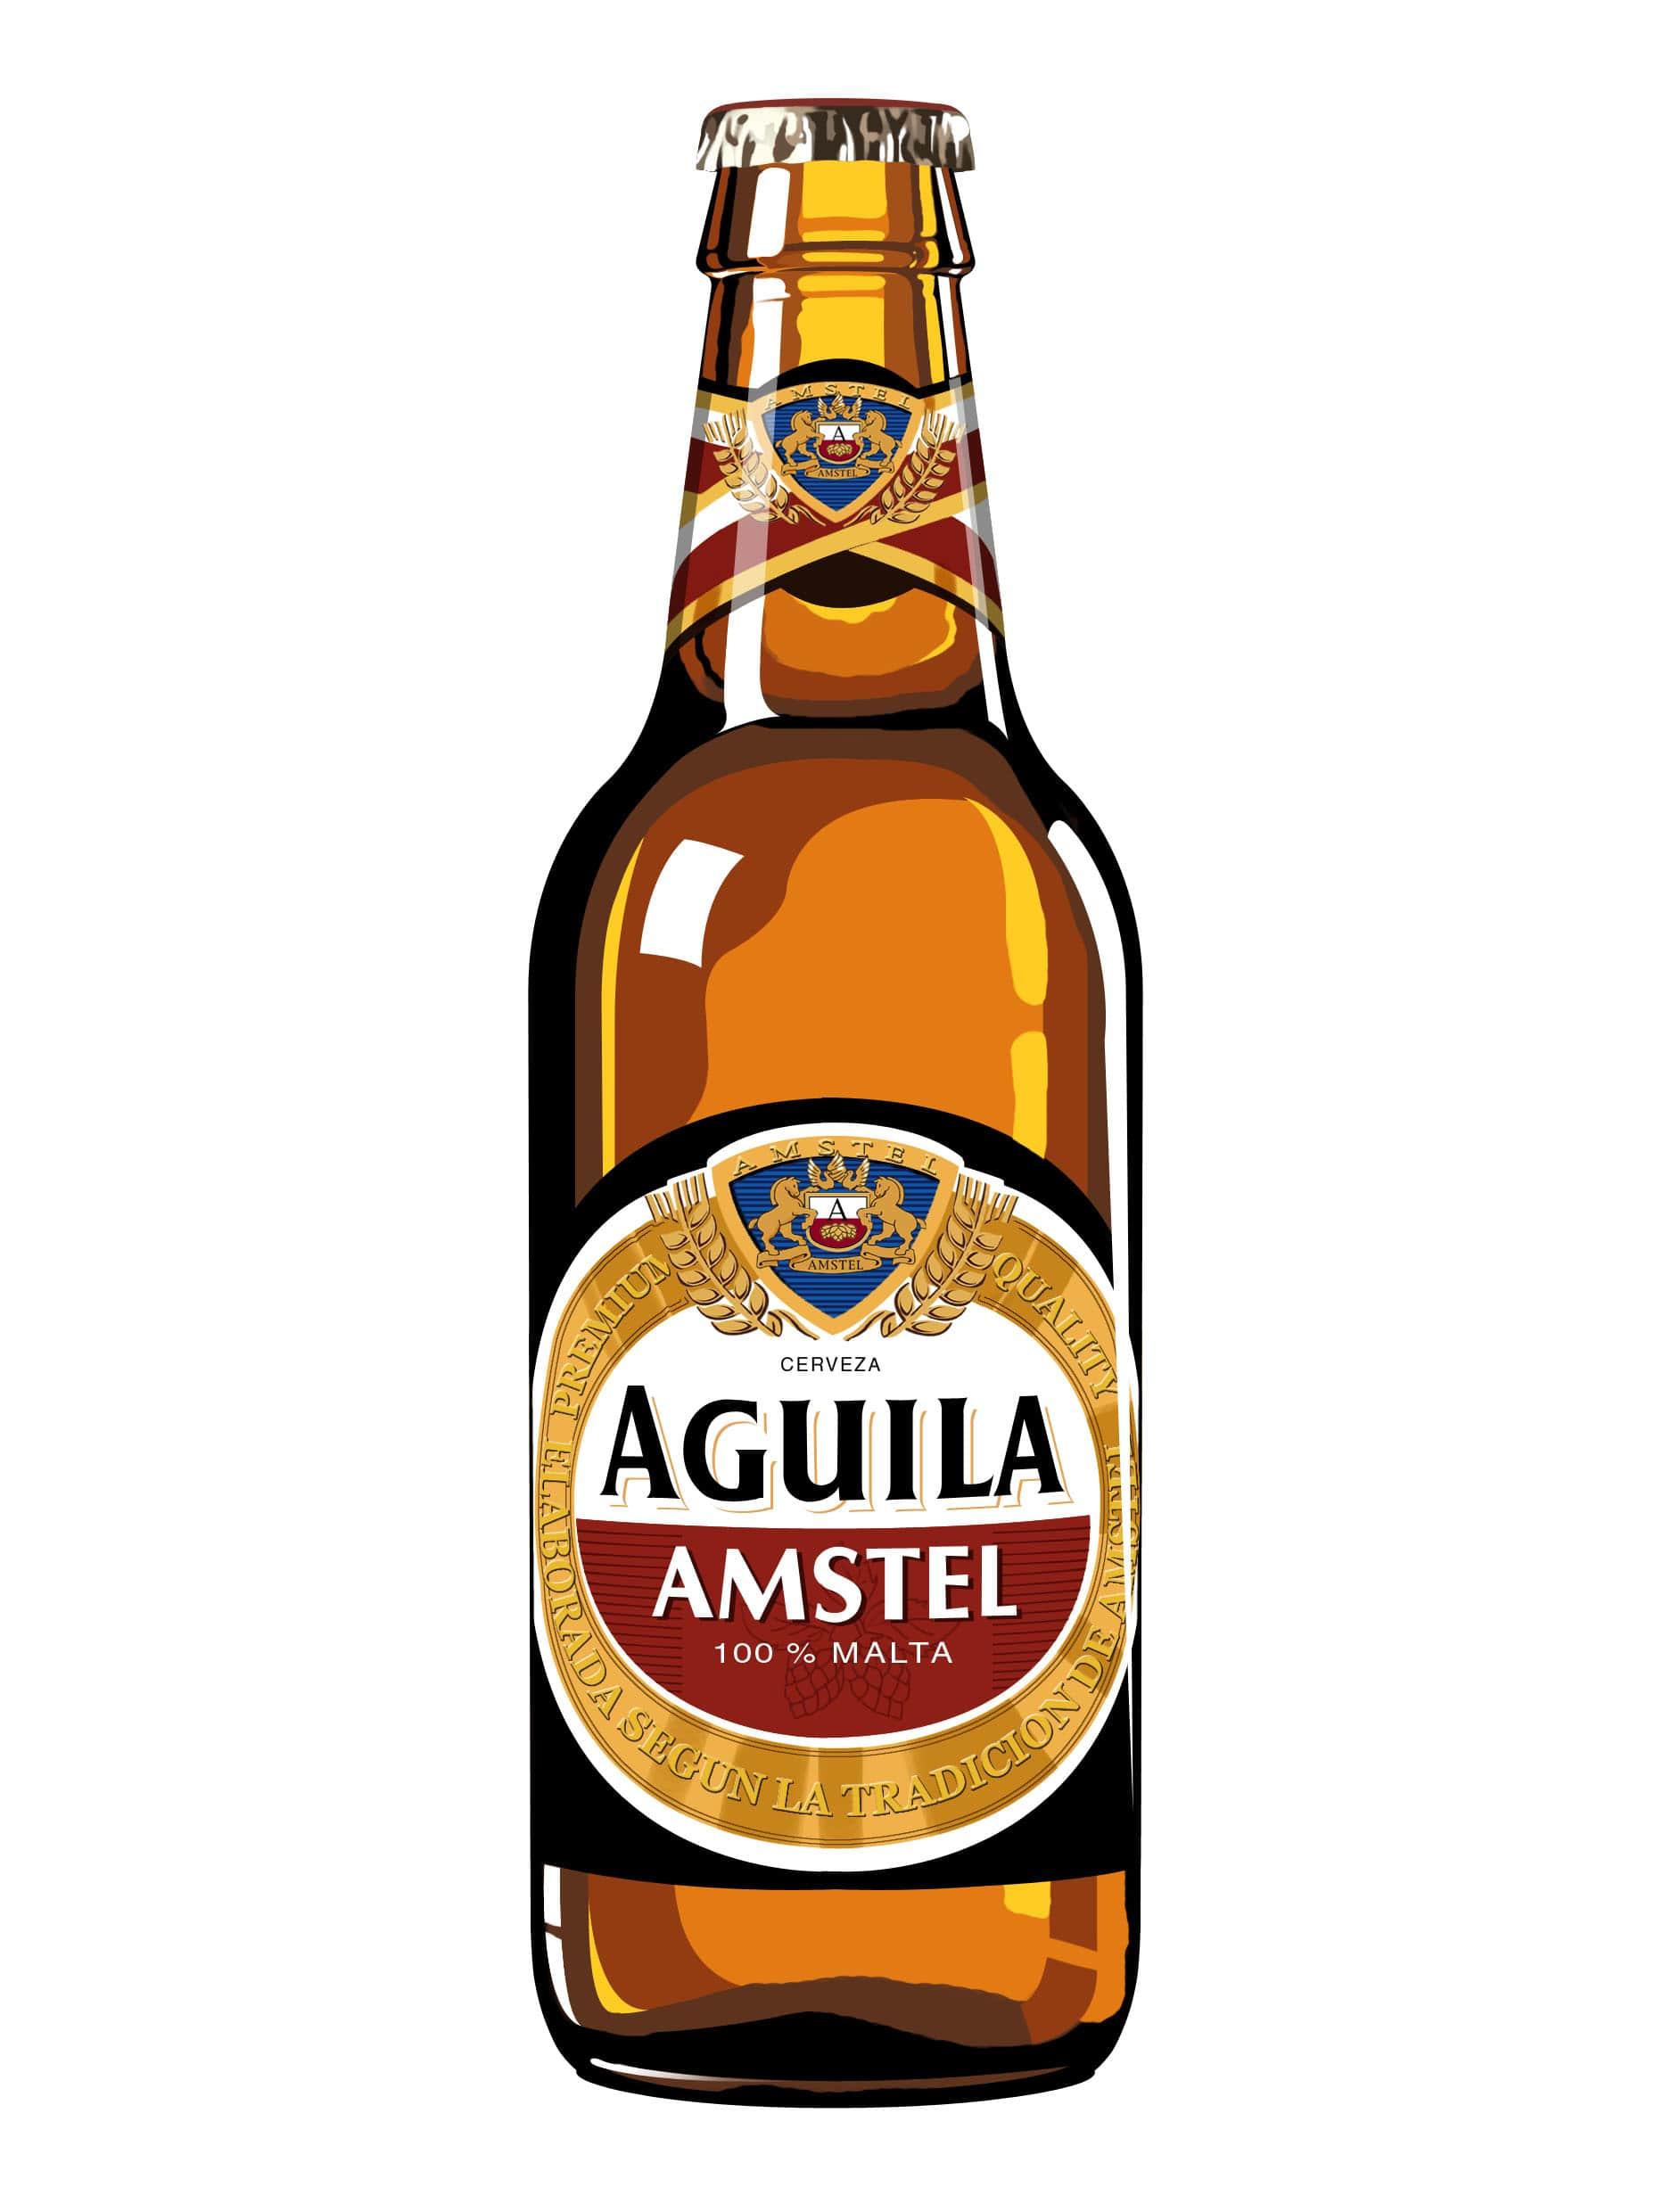 Aguila Amstel